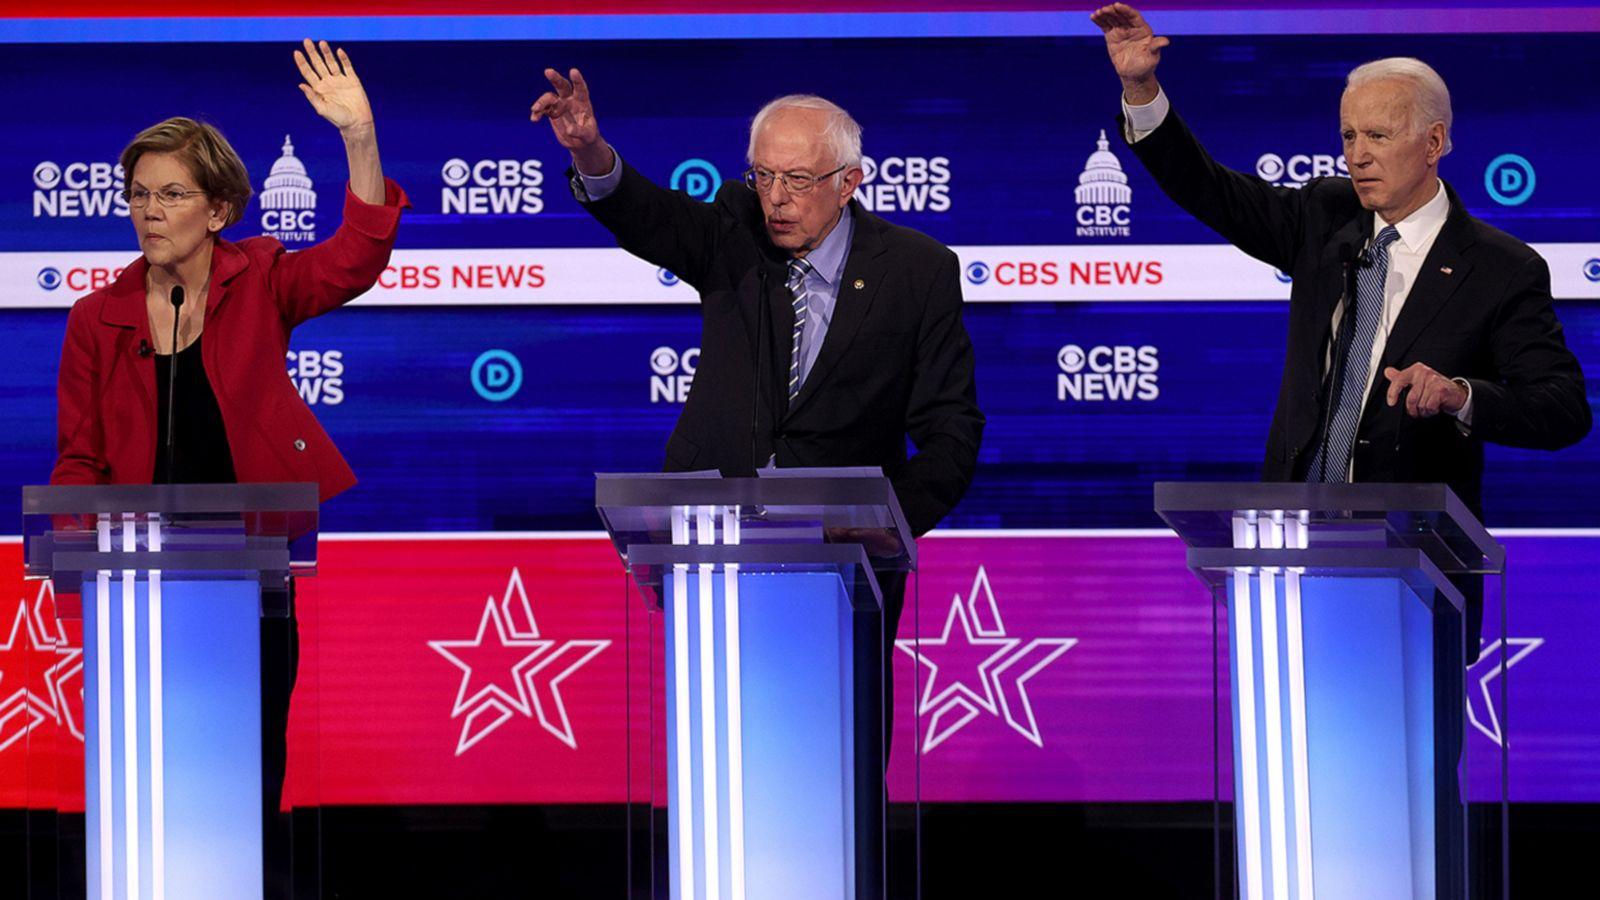 FiveThirtyEight Politics Podcast: Biden fights for a win in South Carolina debate